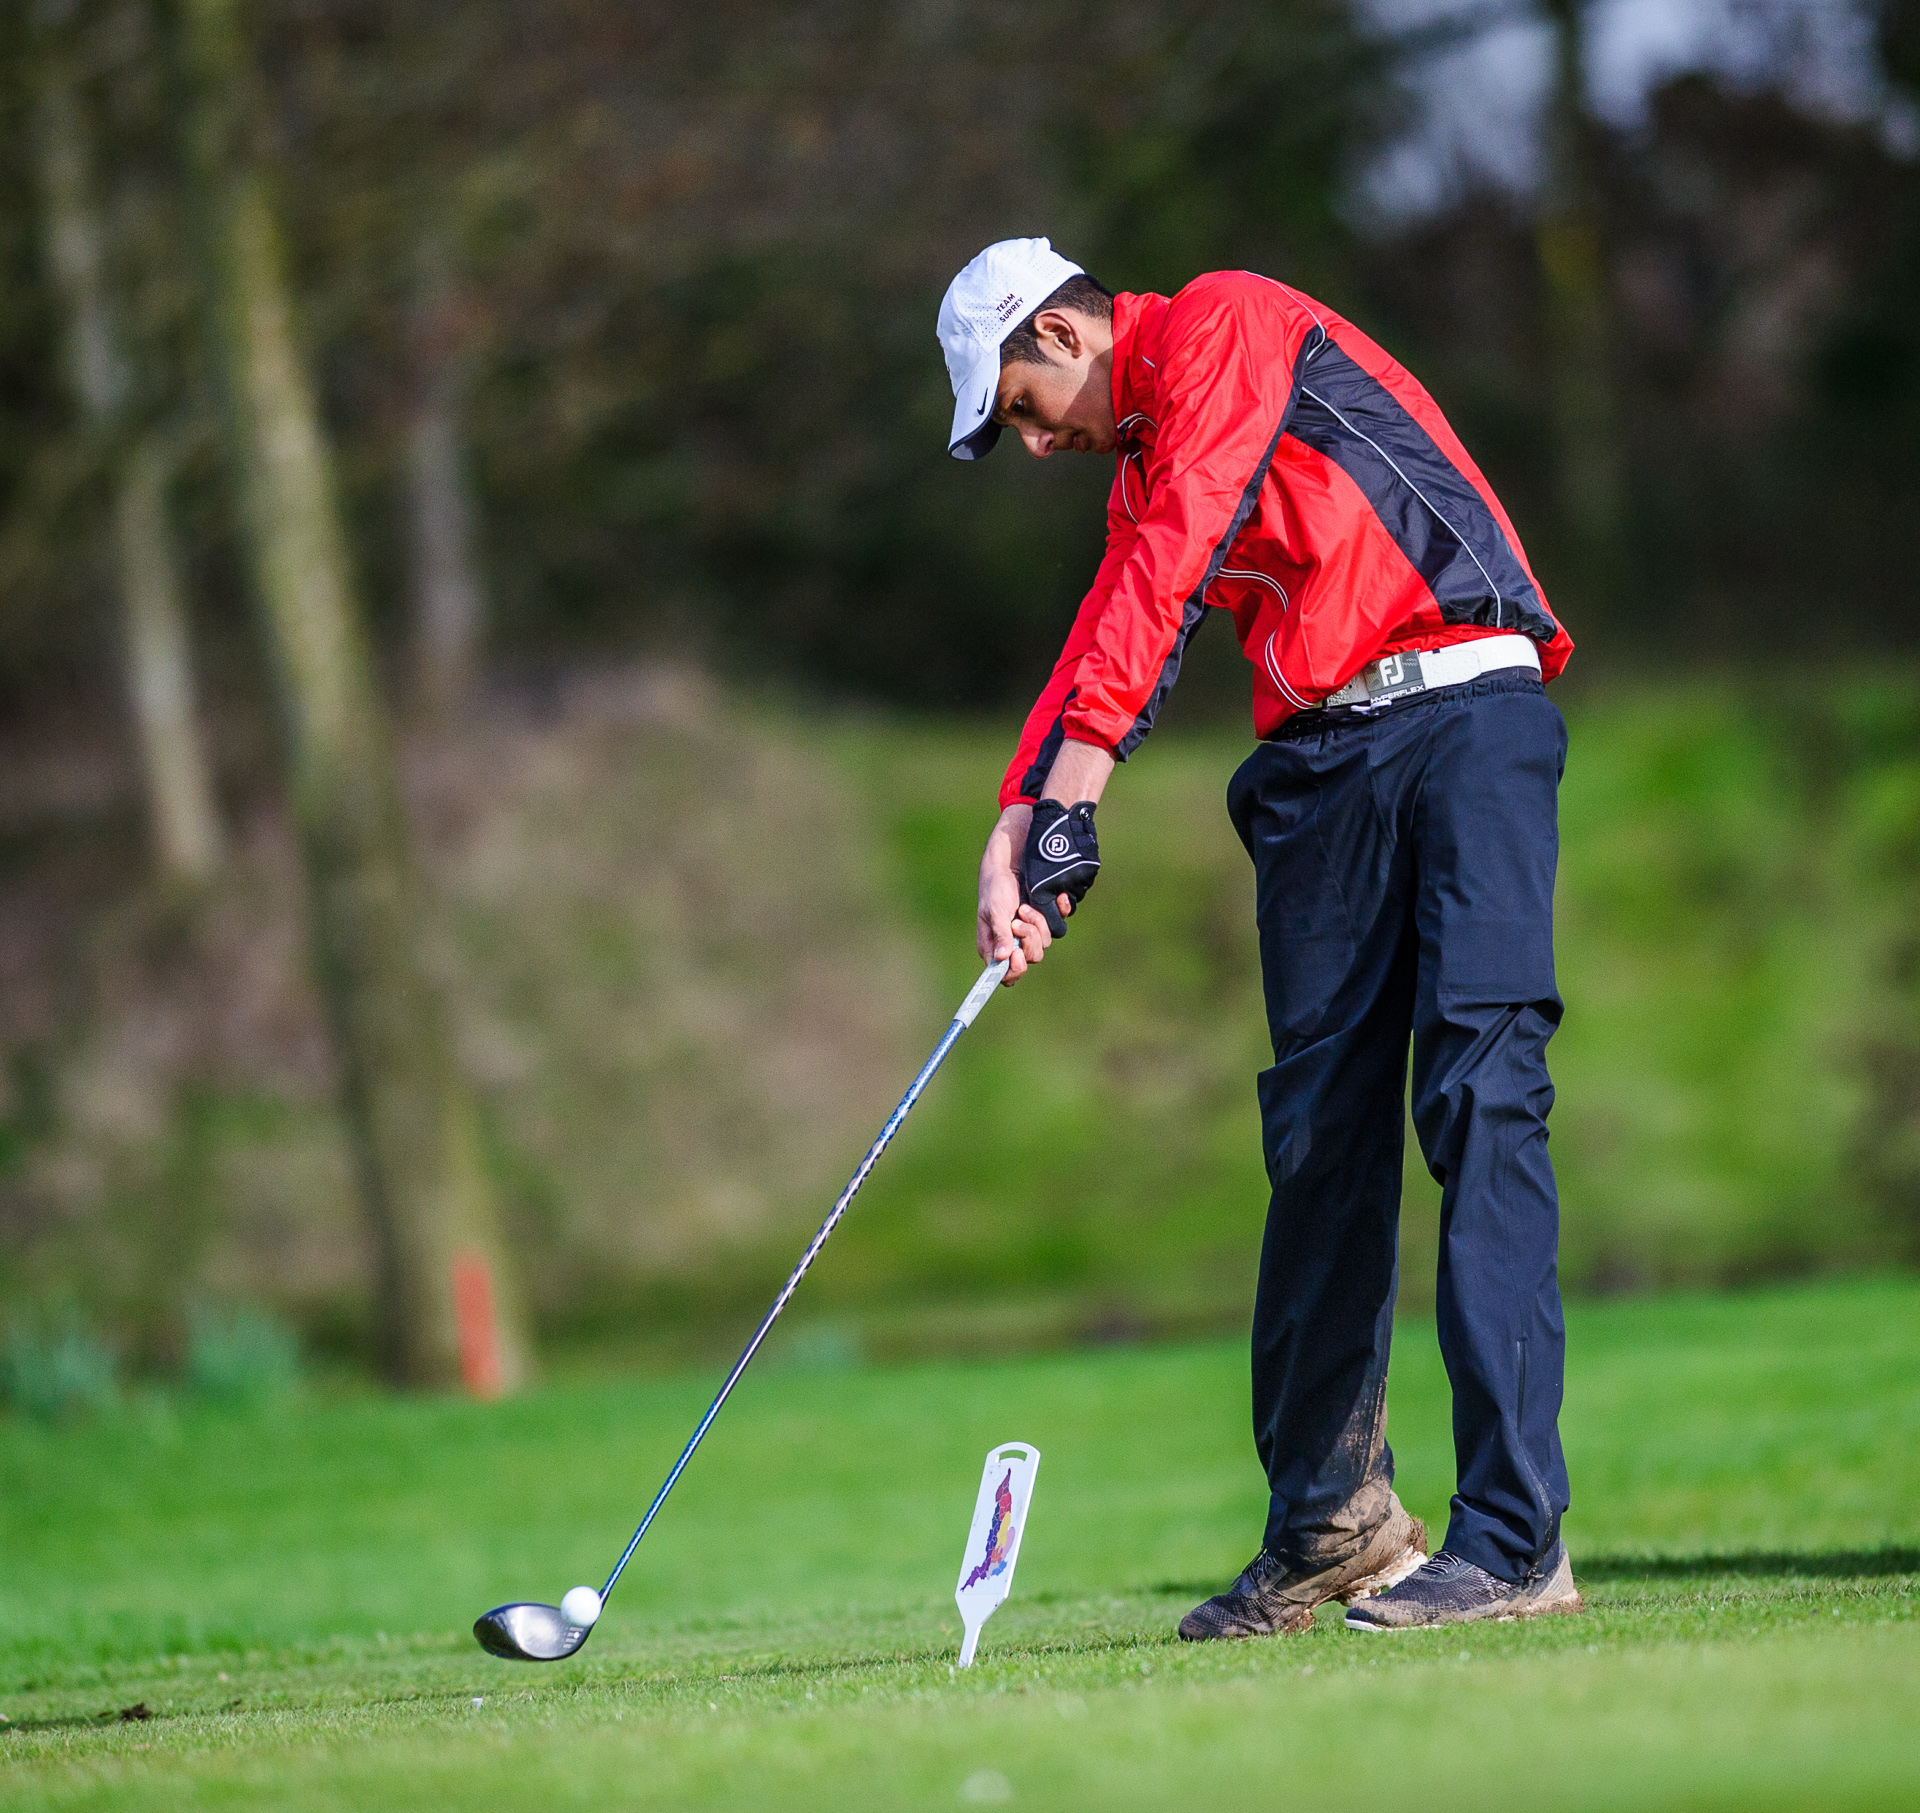 Kevindiss.com golf course photography Hawkstone Park golf course-1181.jpg